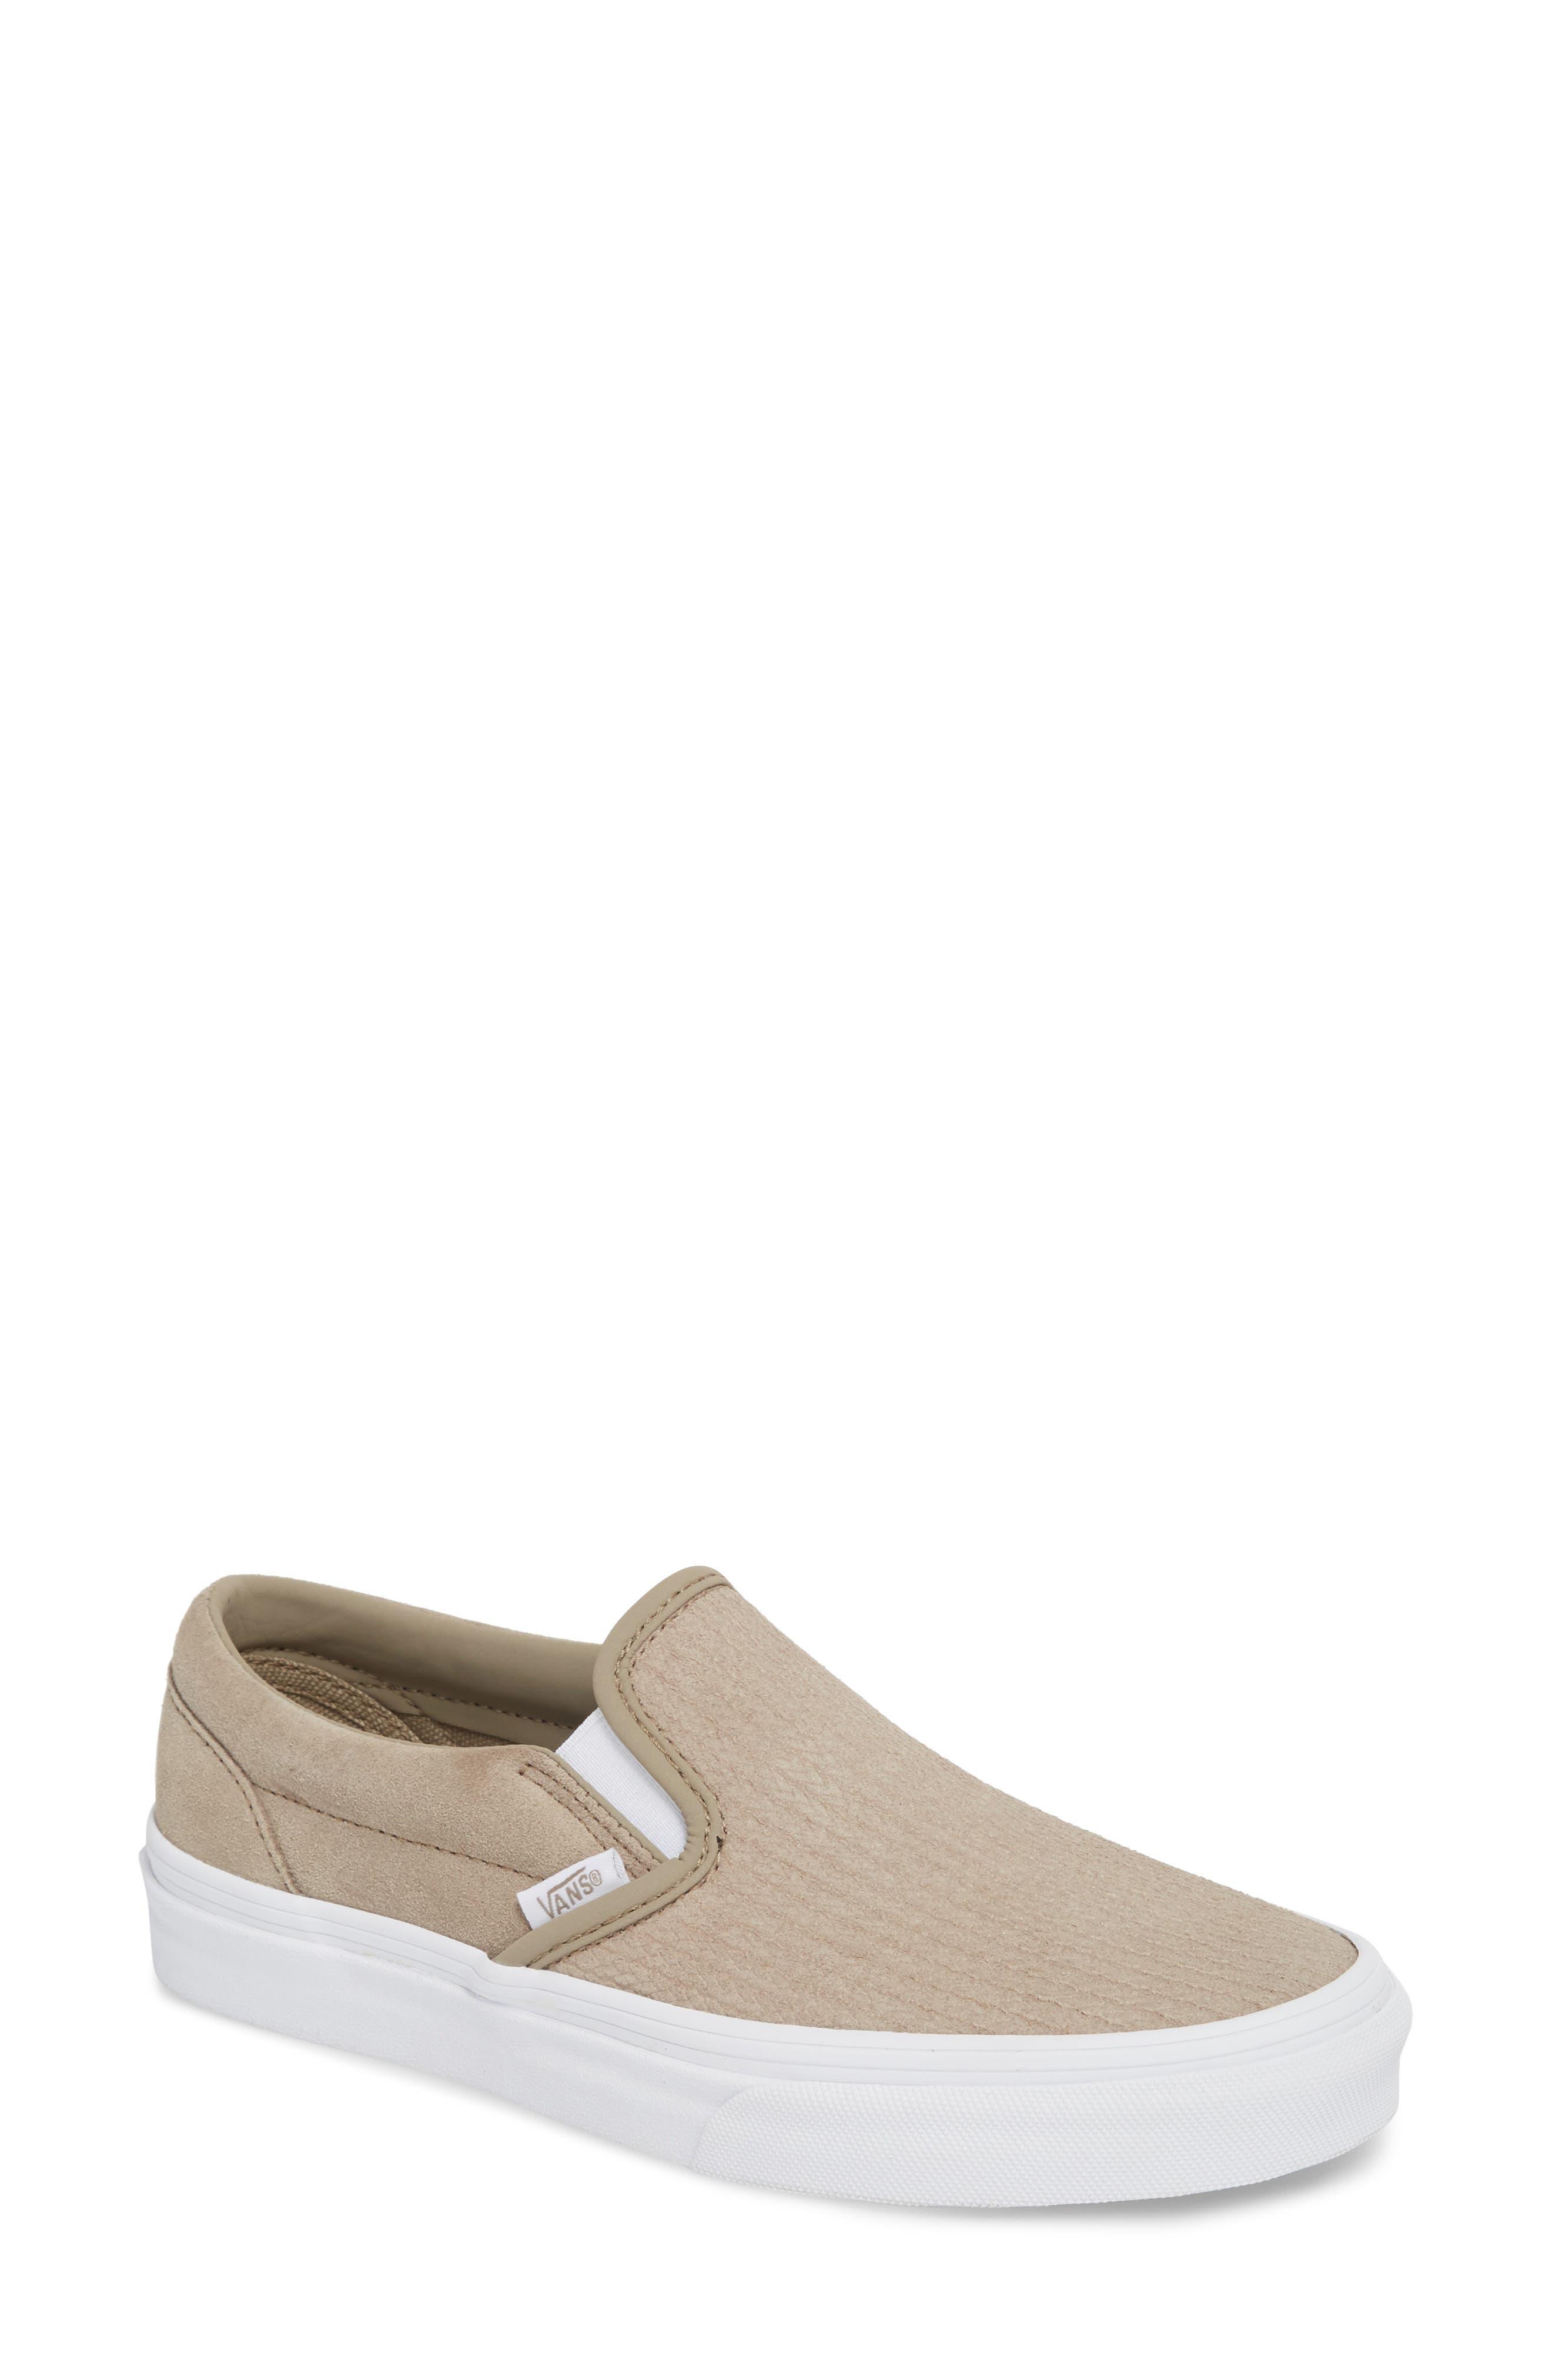 ,                             Classic Slip-On Sneaker,                             Main thumbnail 81, color,                             028